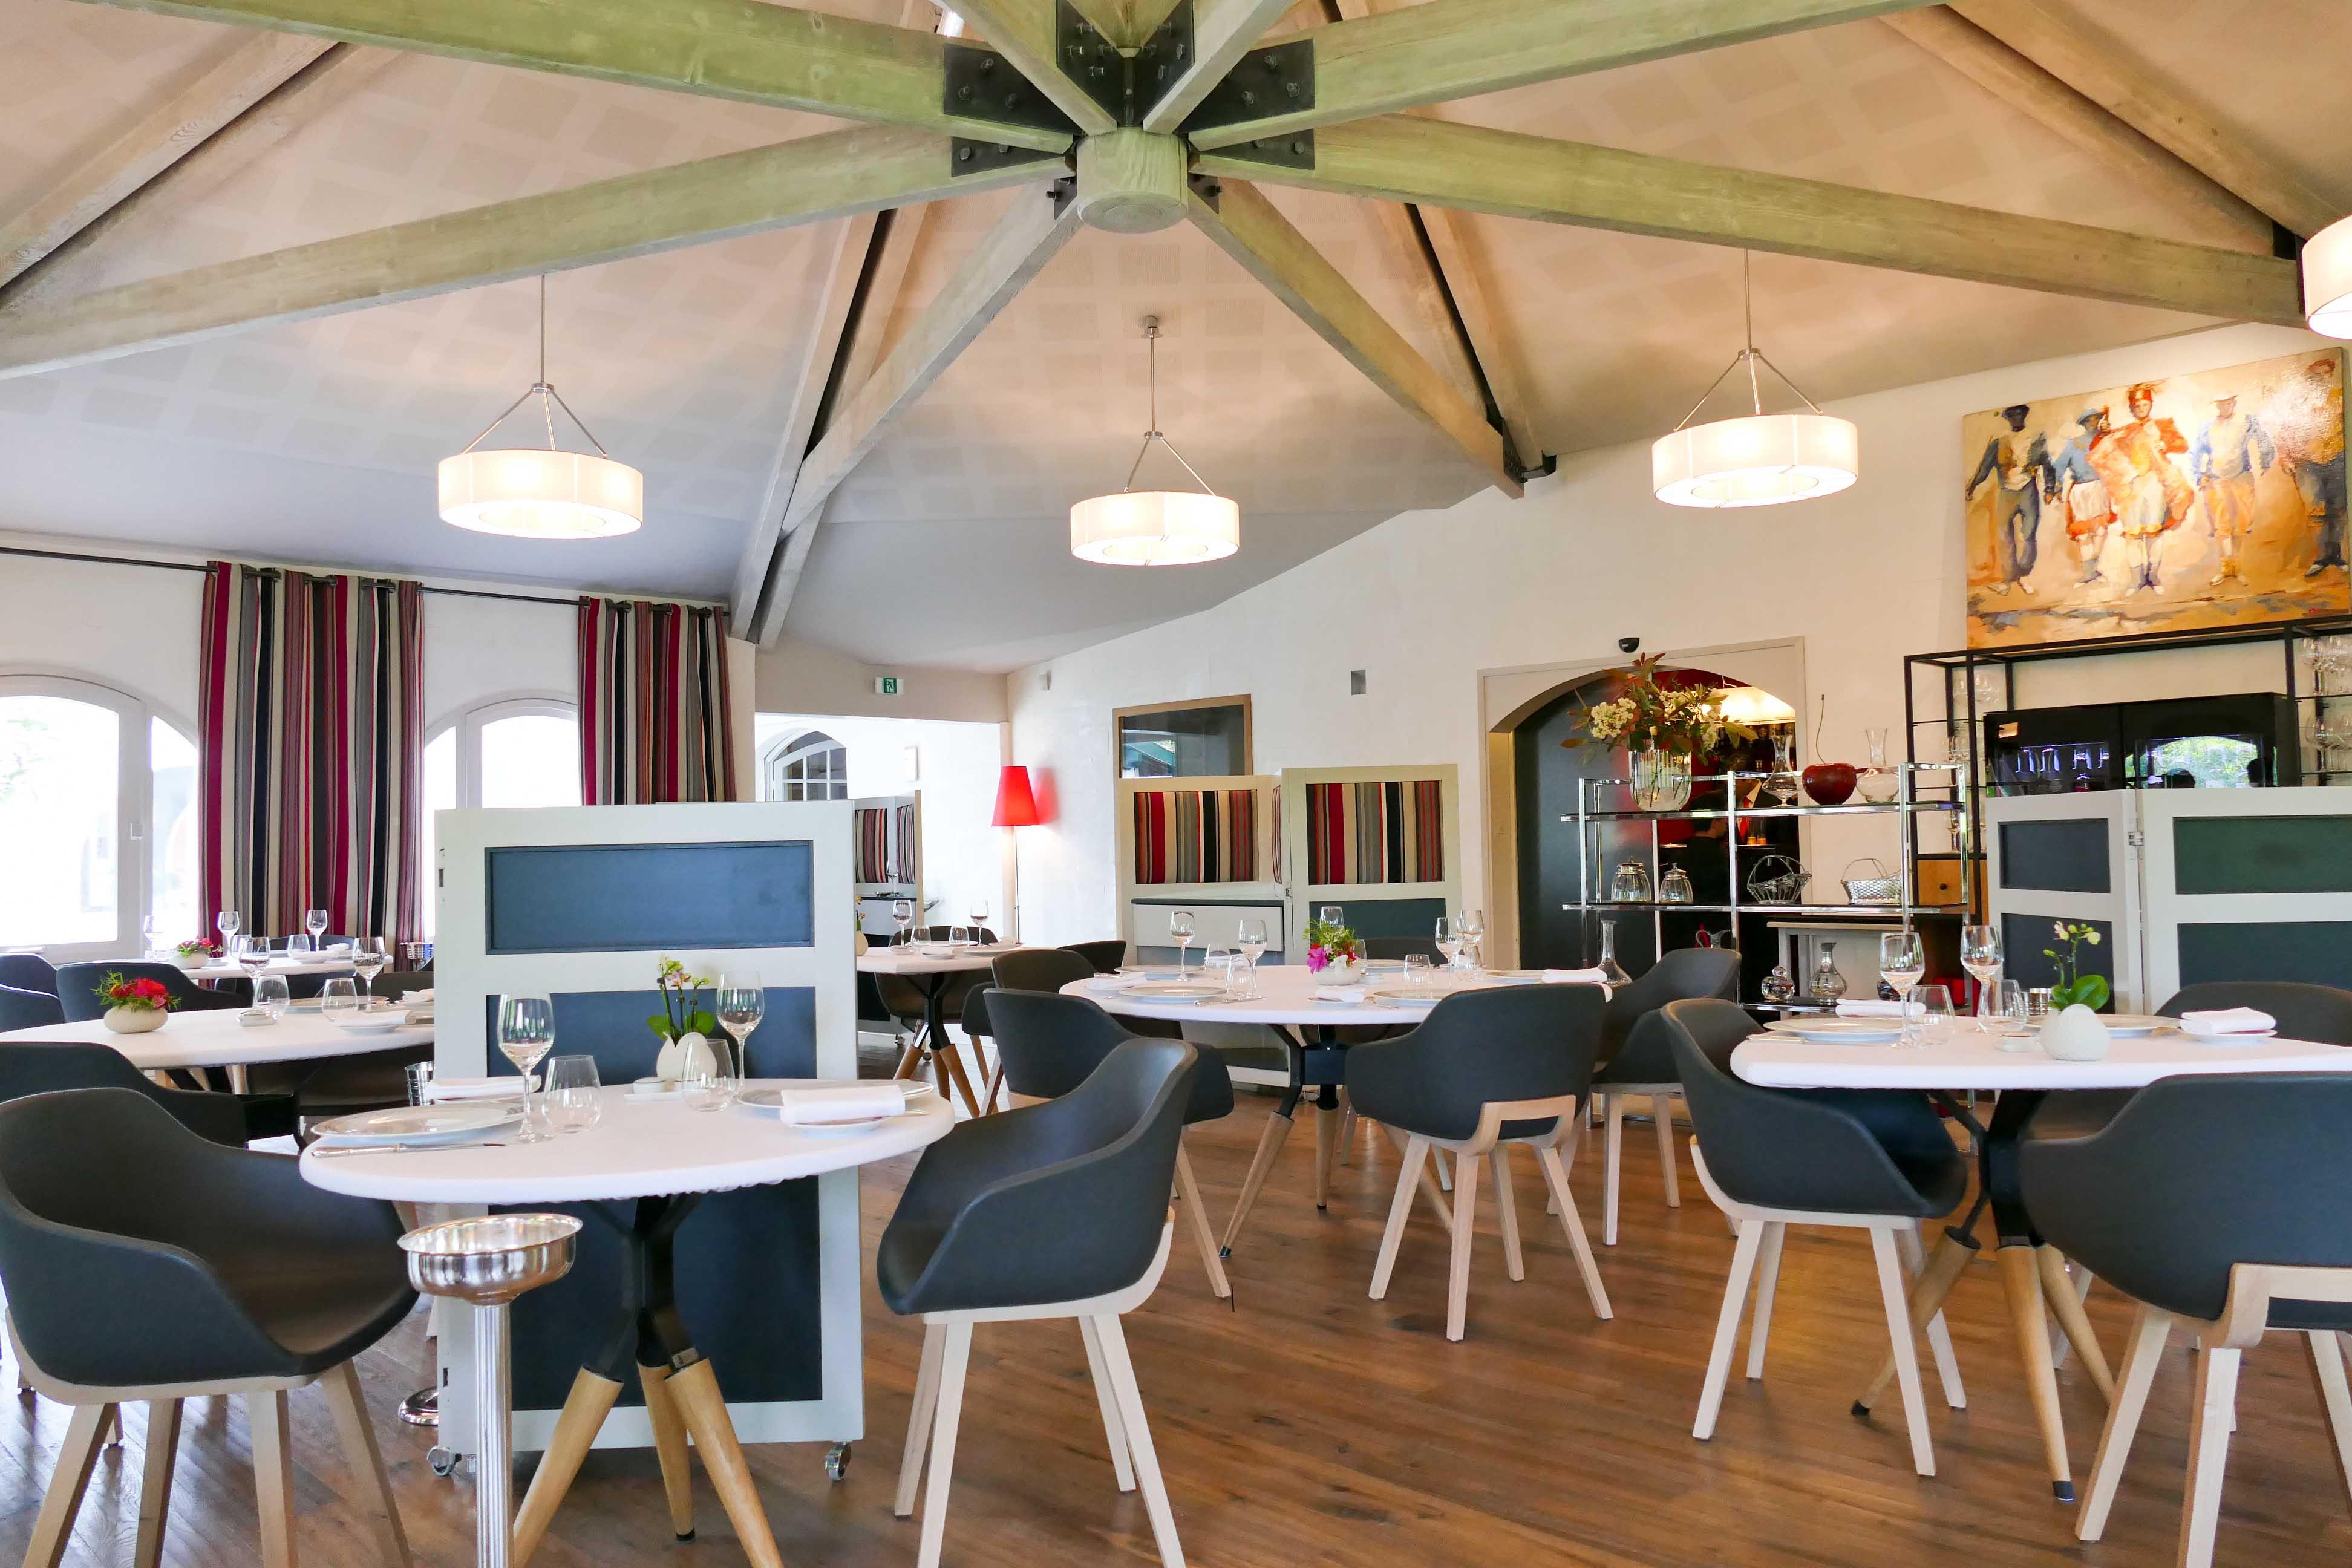 freres ibarboure restaurant bidart pays basque. Black Bedroom Furniture Sets. Home Design Ideas